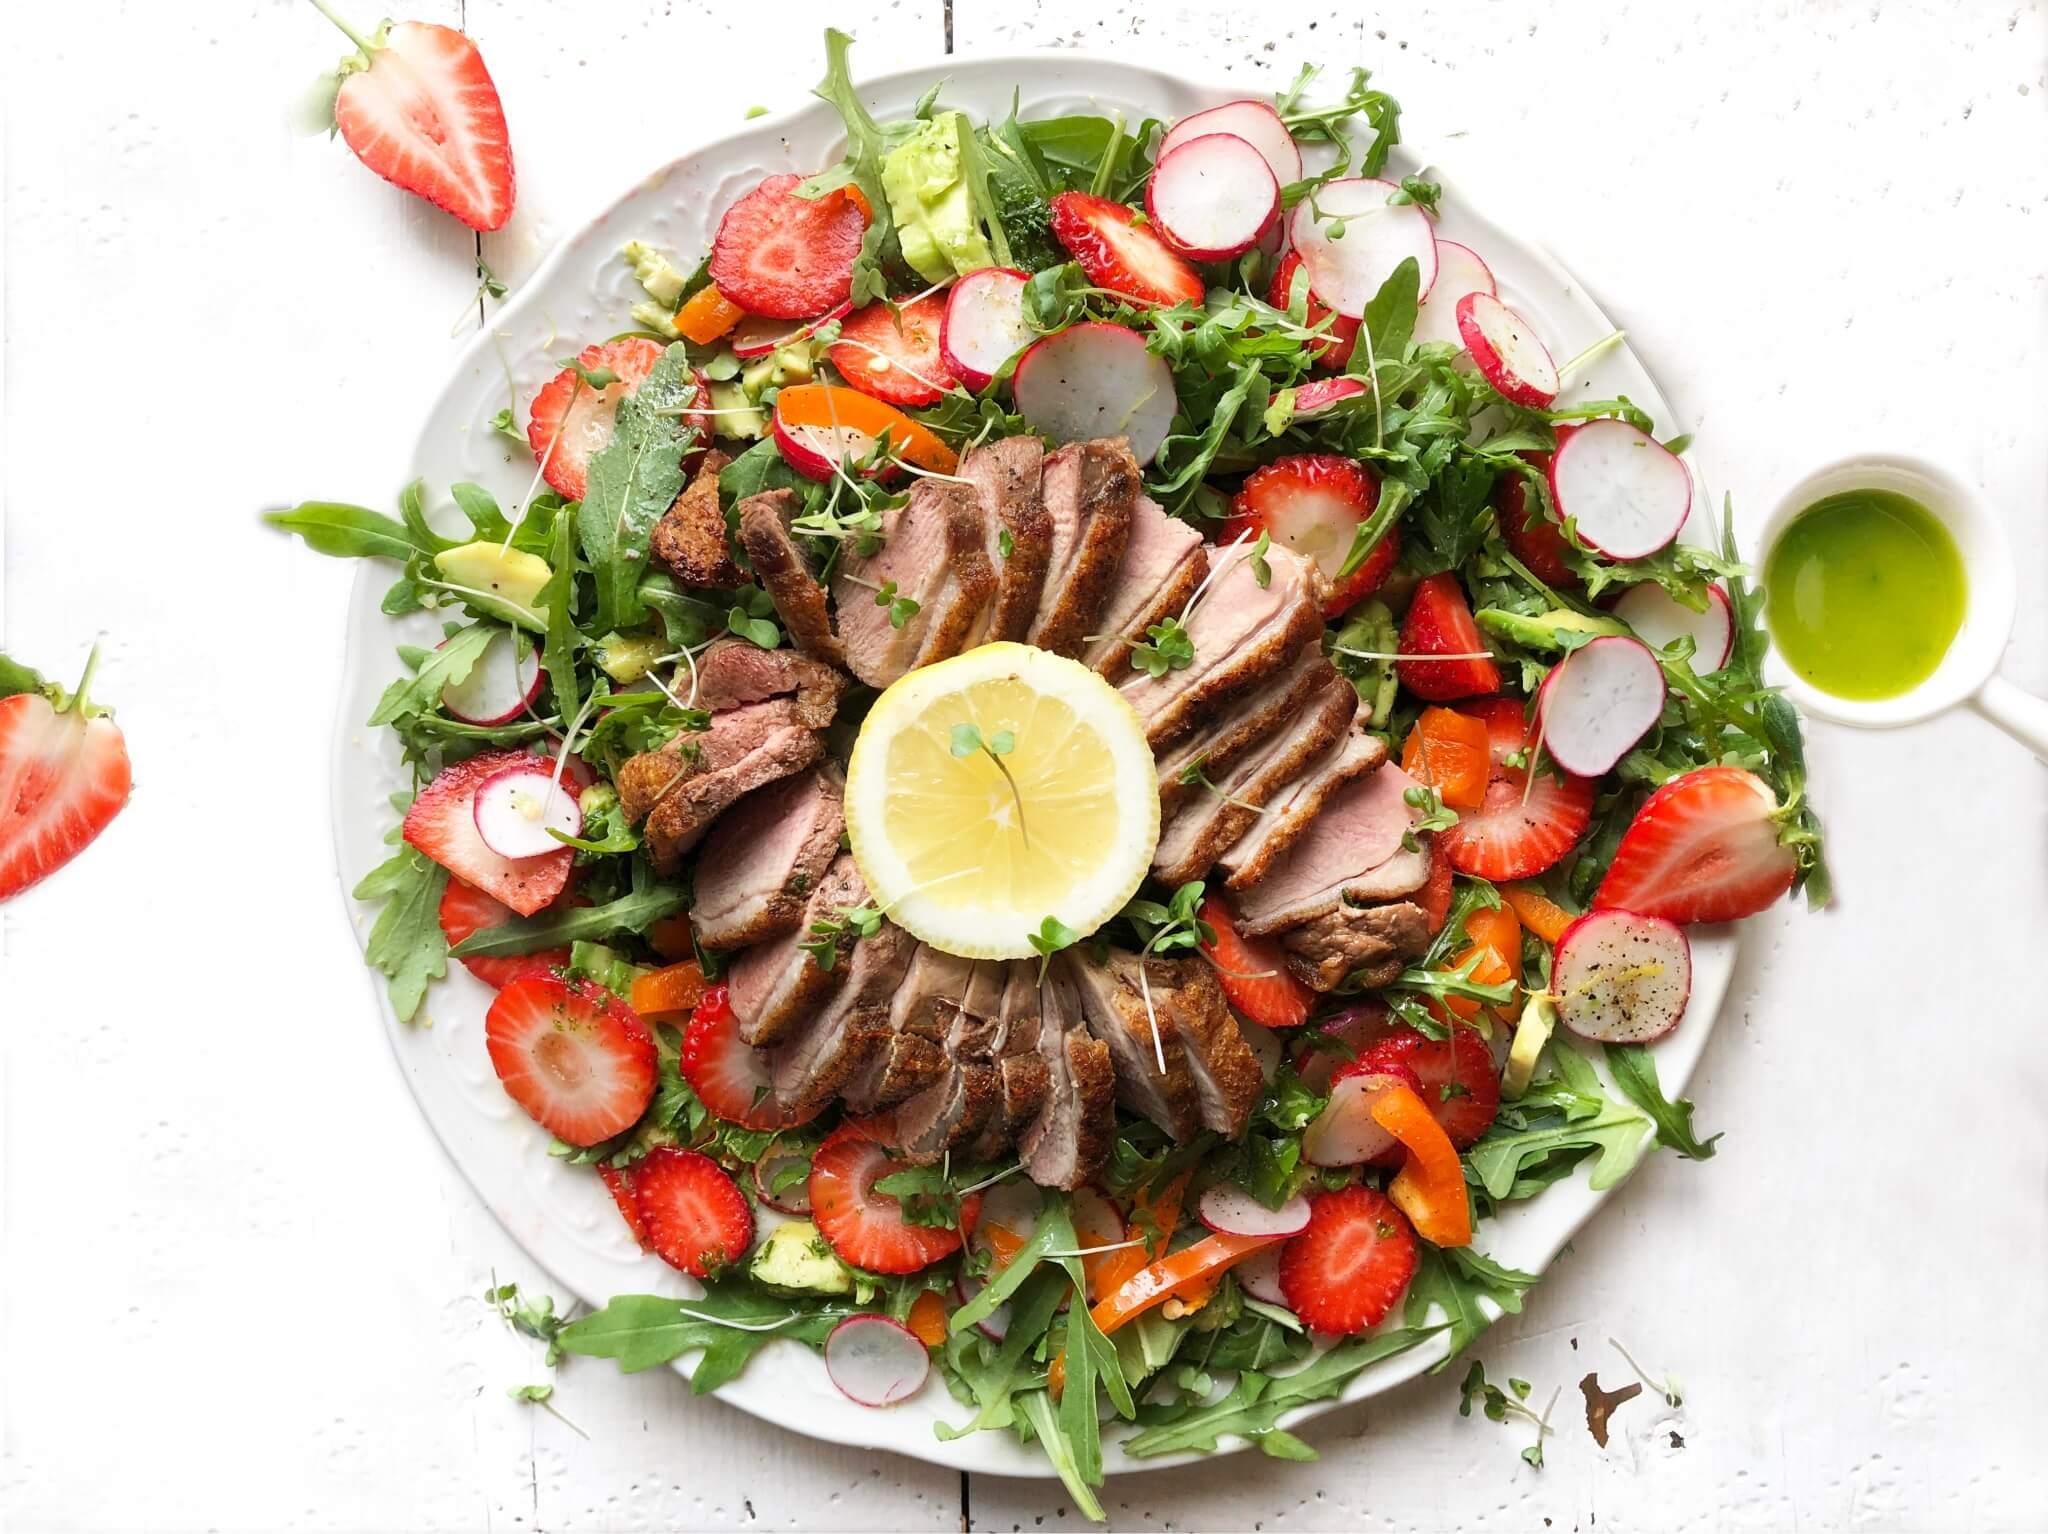 Salade met eendenborst, aardbei en kruidendressing